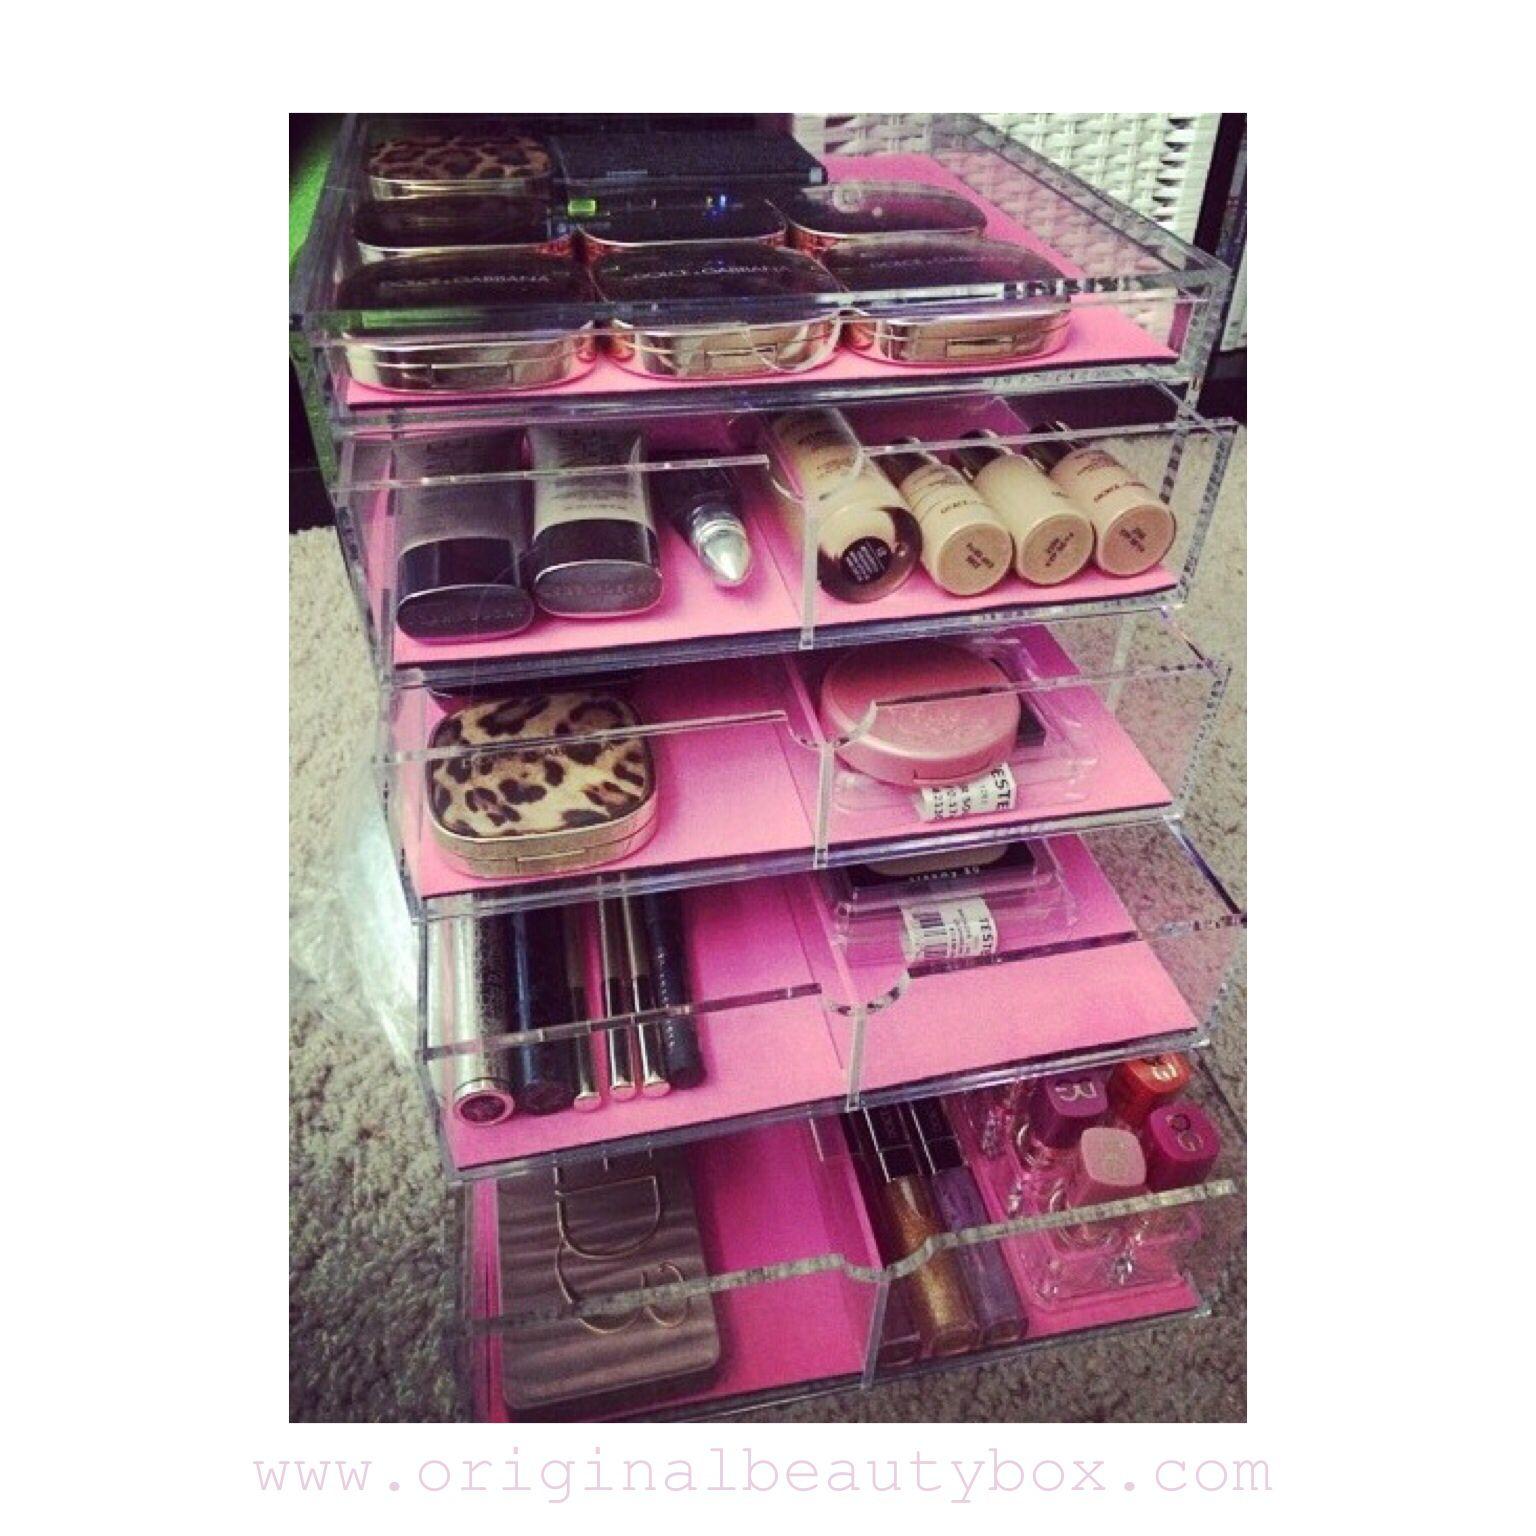 Muji Beauty Storage Httpwwwmujieupagesonlineaspqmde=Pr&Qprd=236 - Organization - Pinterest - Muji,